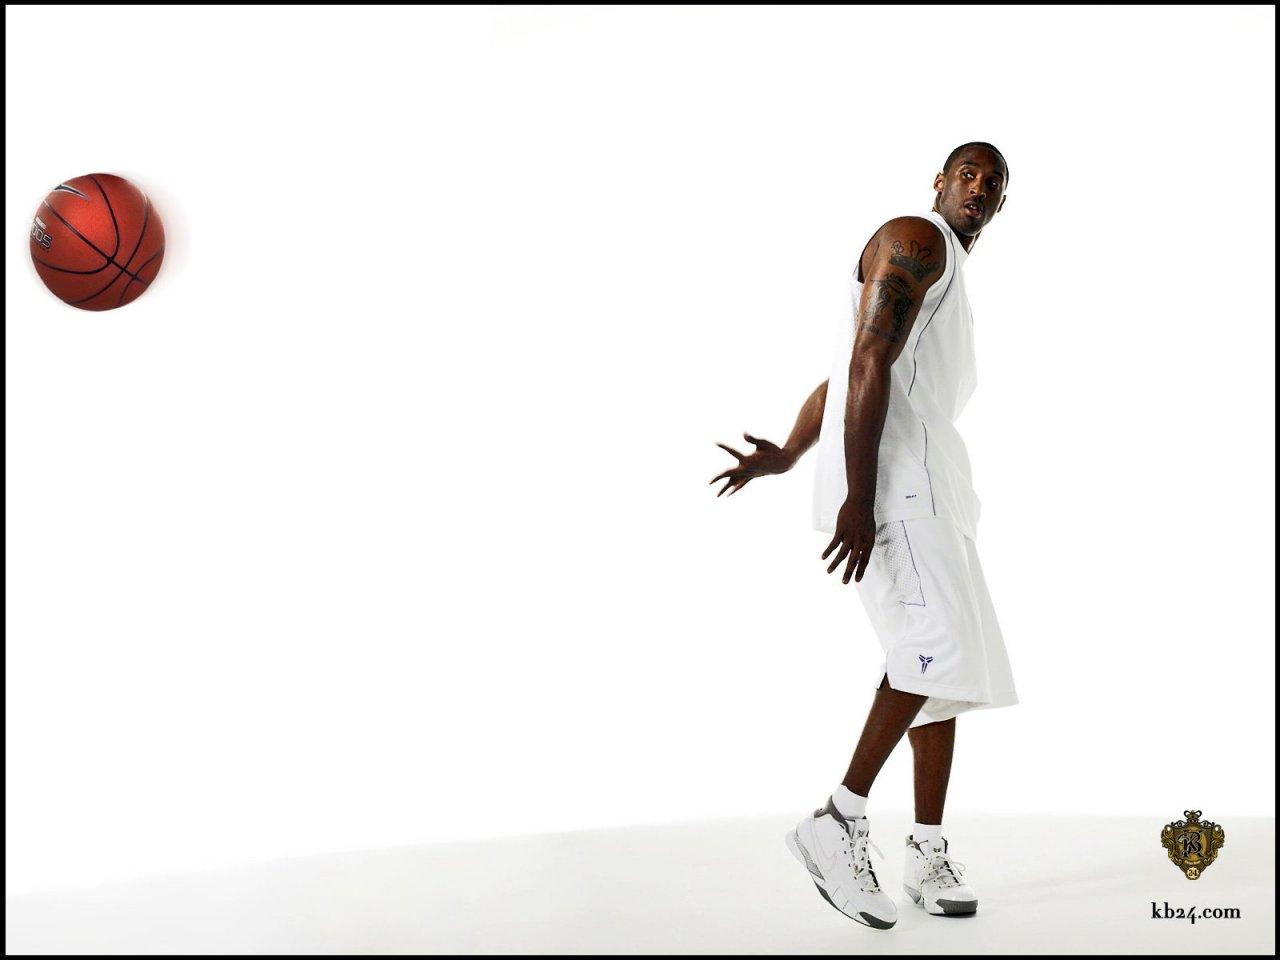 http://1.bp.blogspot.com/-epwu85IYtUM/TjPJMOClOiI/AAAAAAAAAKY/QfSS3YDvuKI/s1600/kobe-bryant-nba-basketball-star2_wallpaper_1280x960.jpg